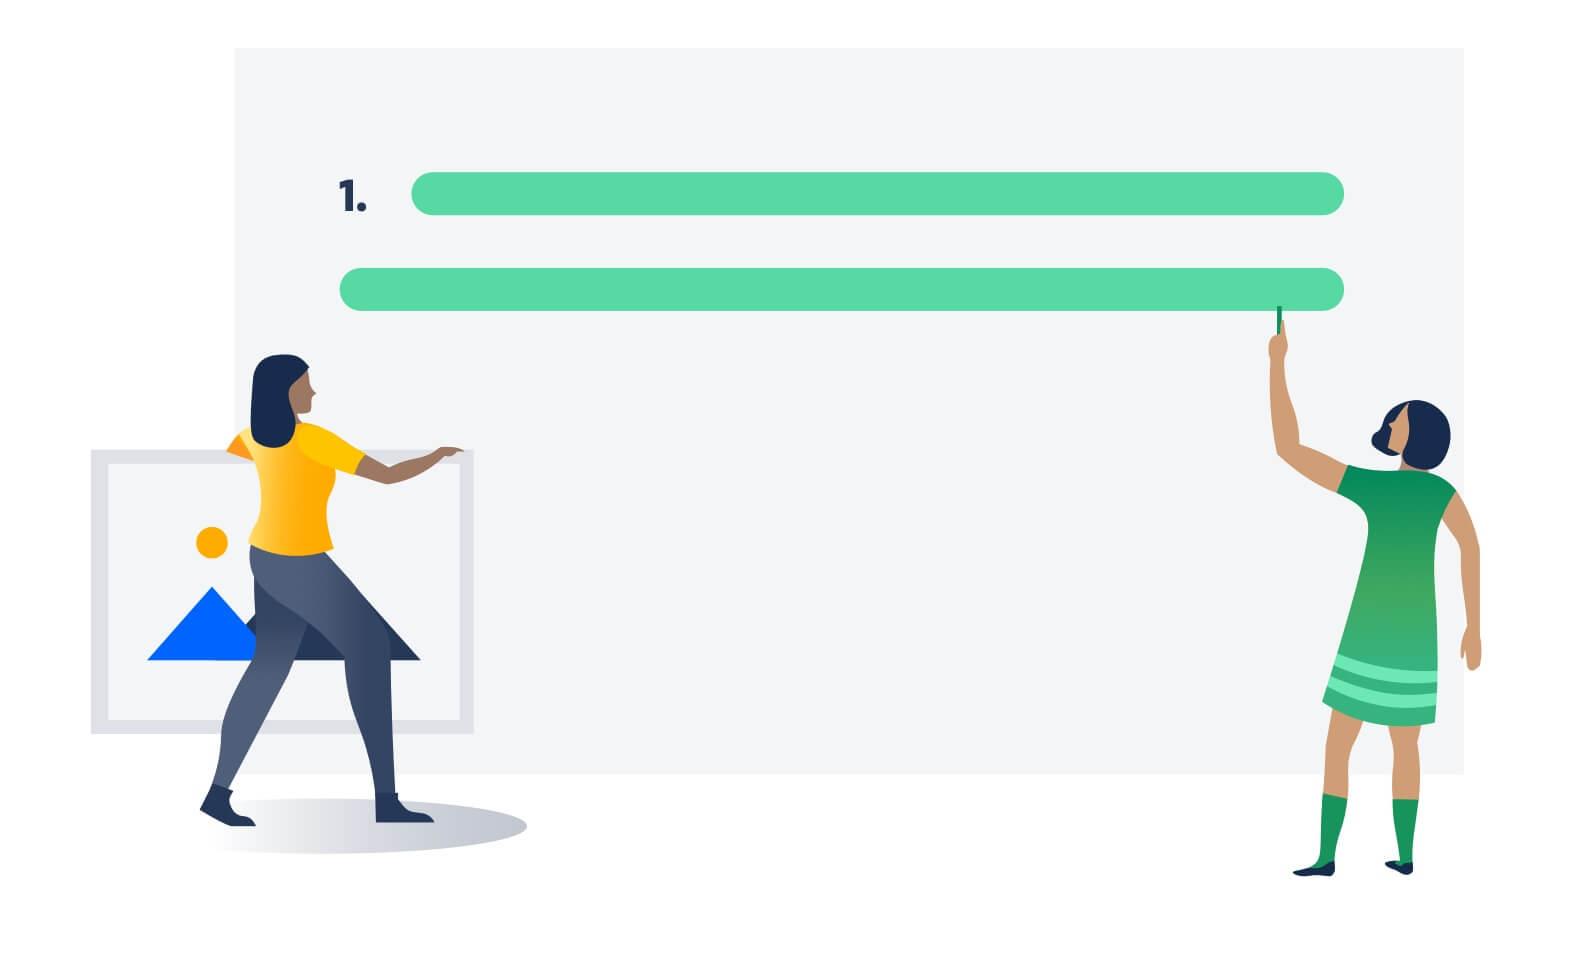 Schritt3: Abbildungen, Grafiken und Screenshots zusammenstellen